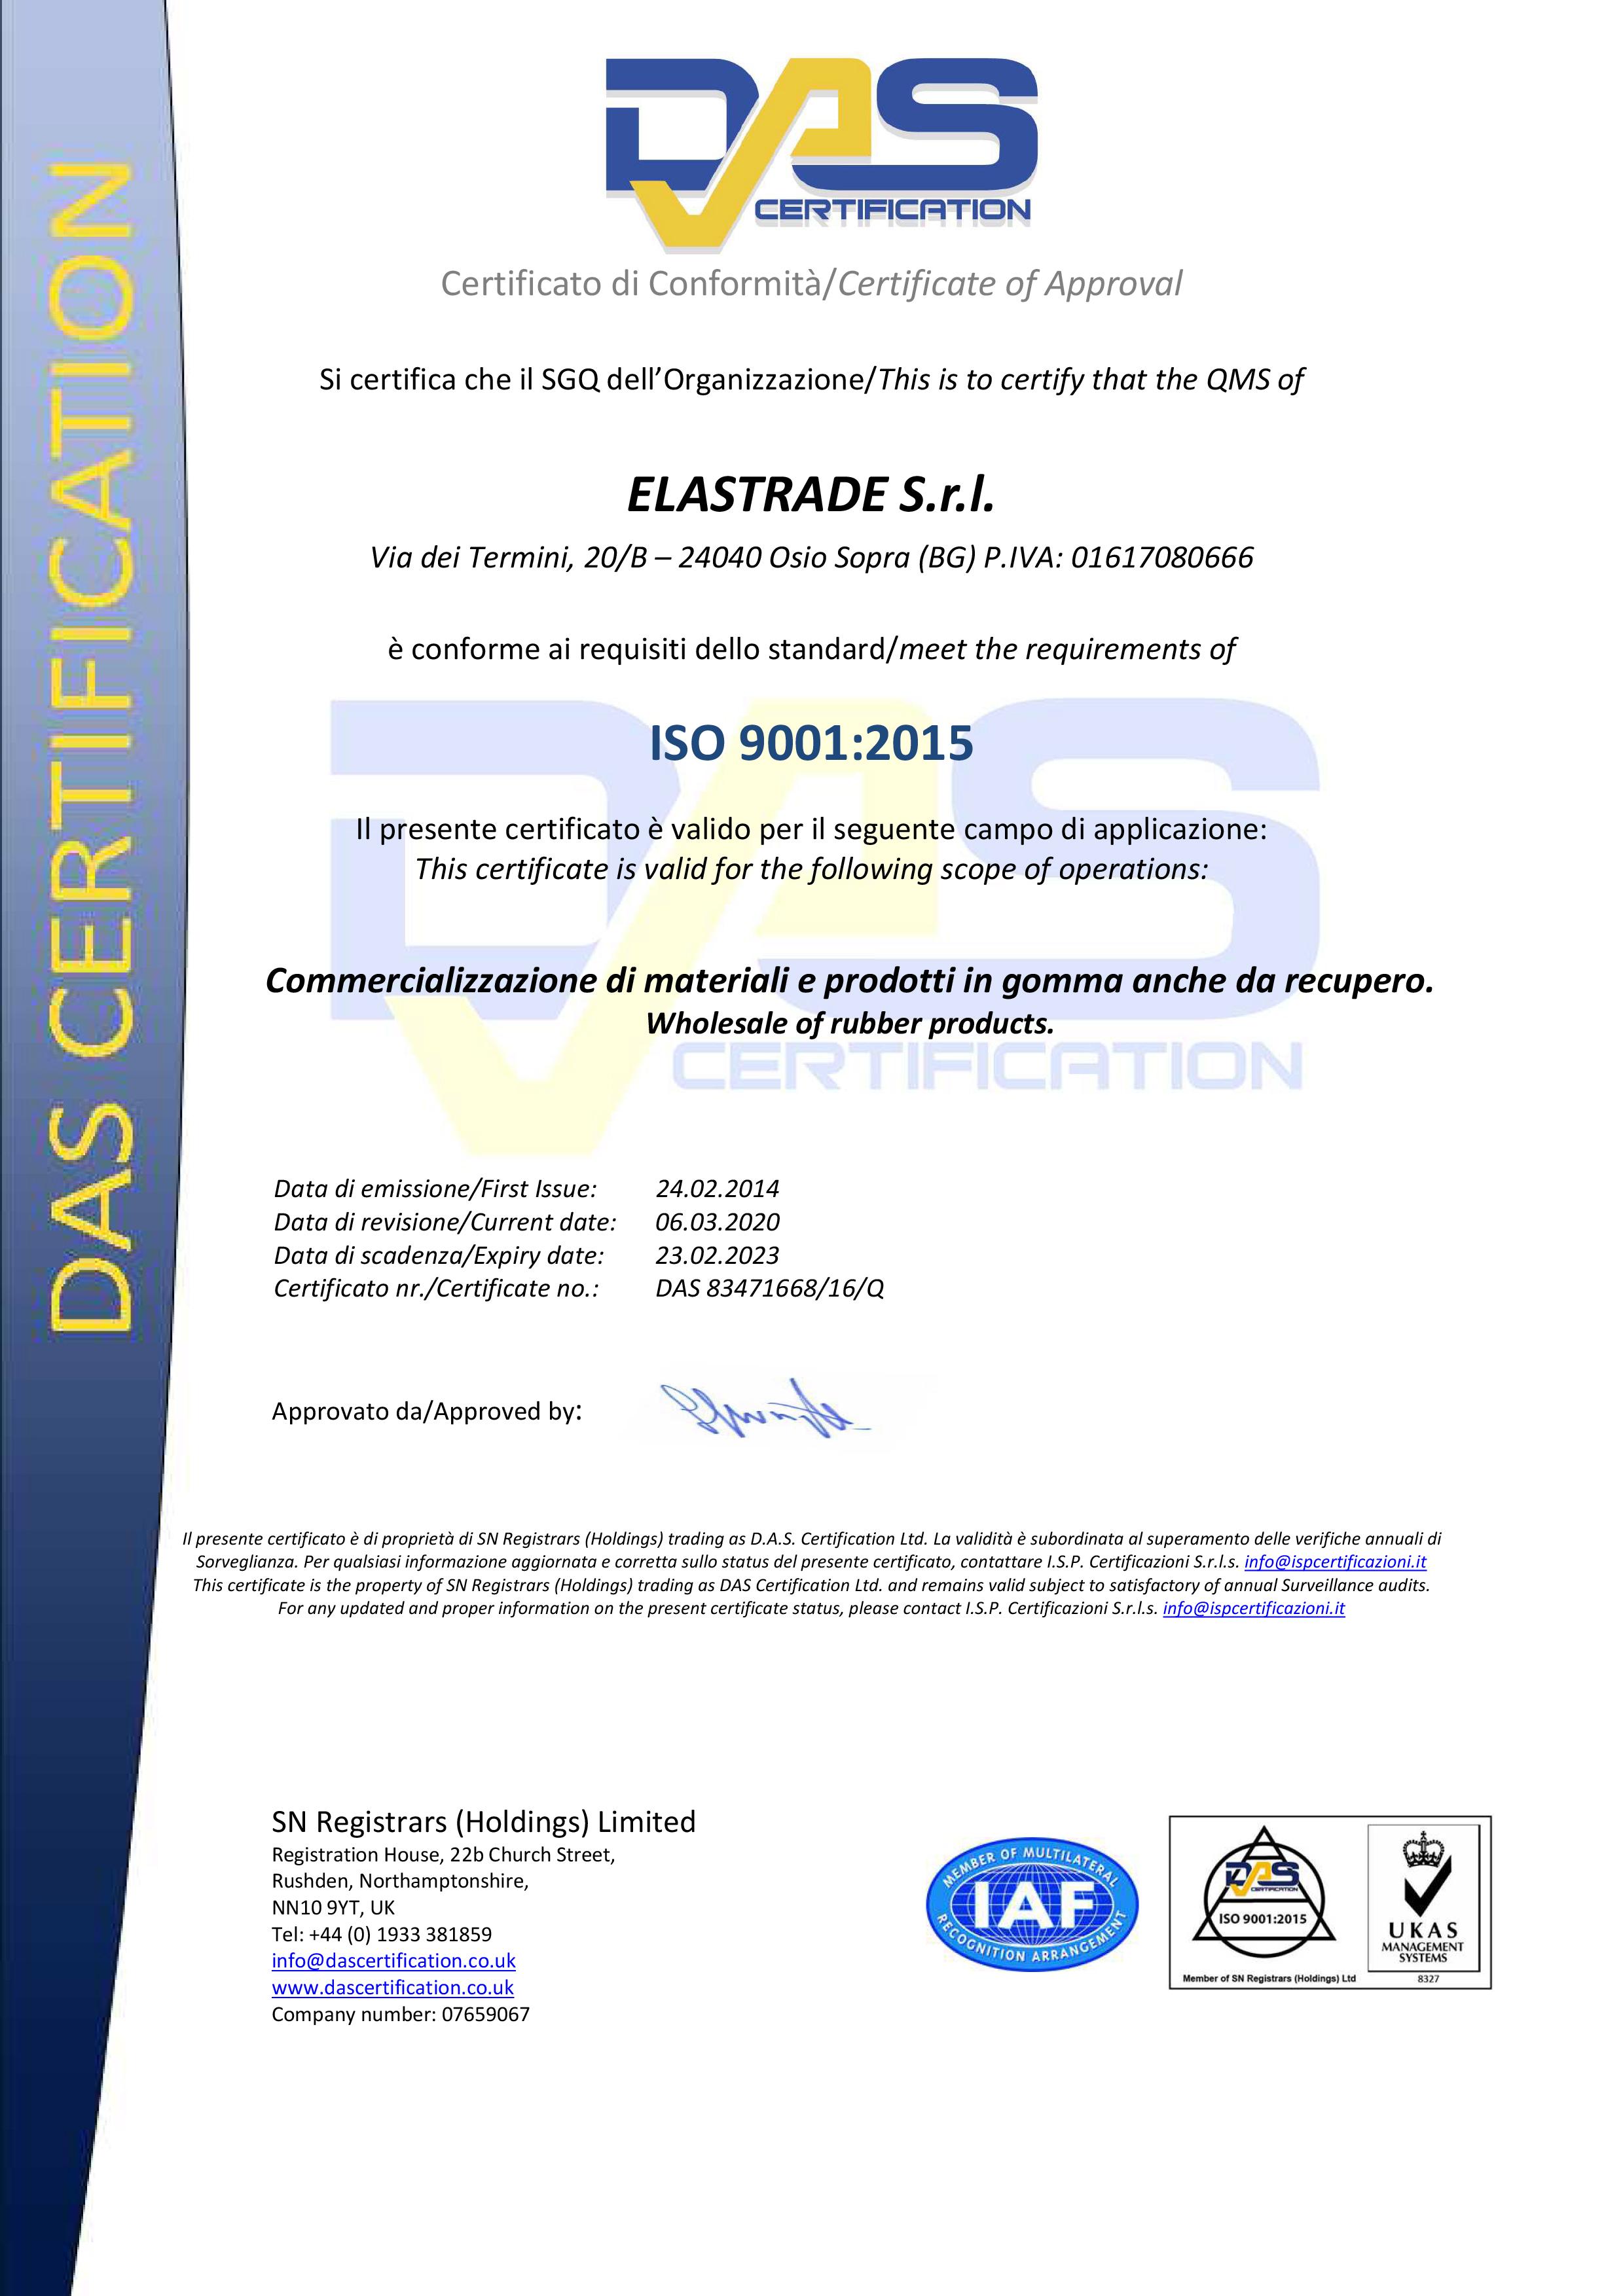 das certification ISO 9001:2015